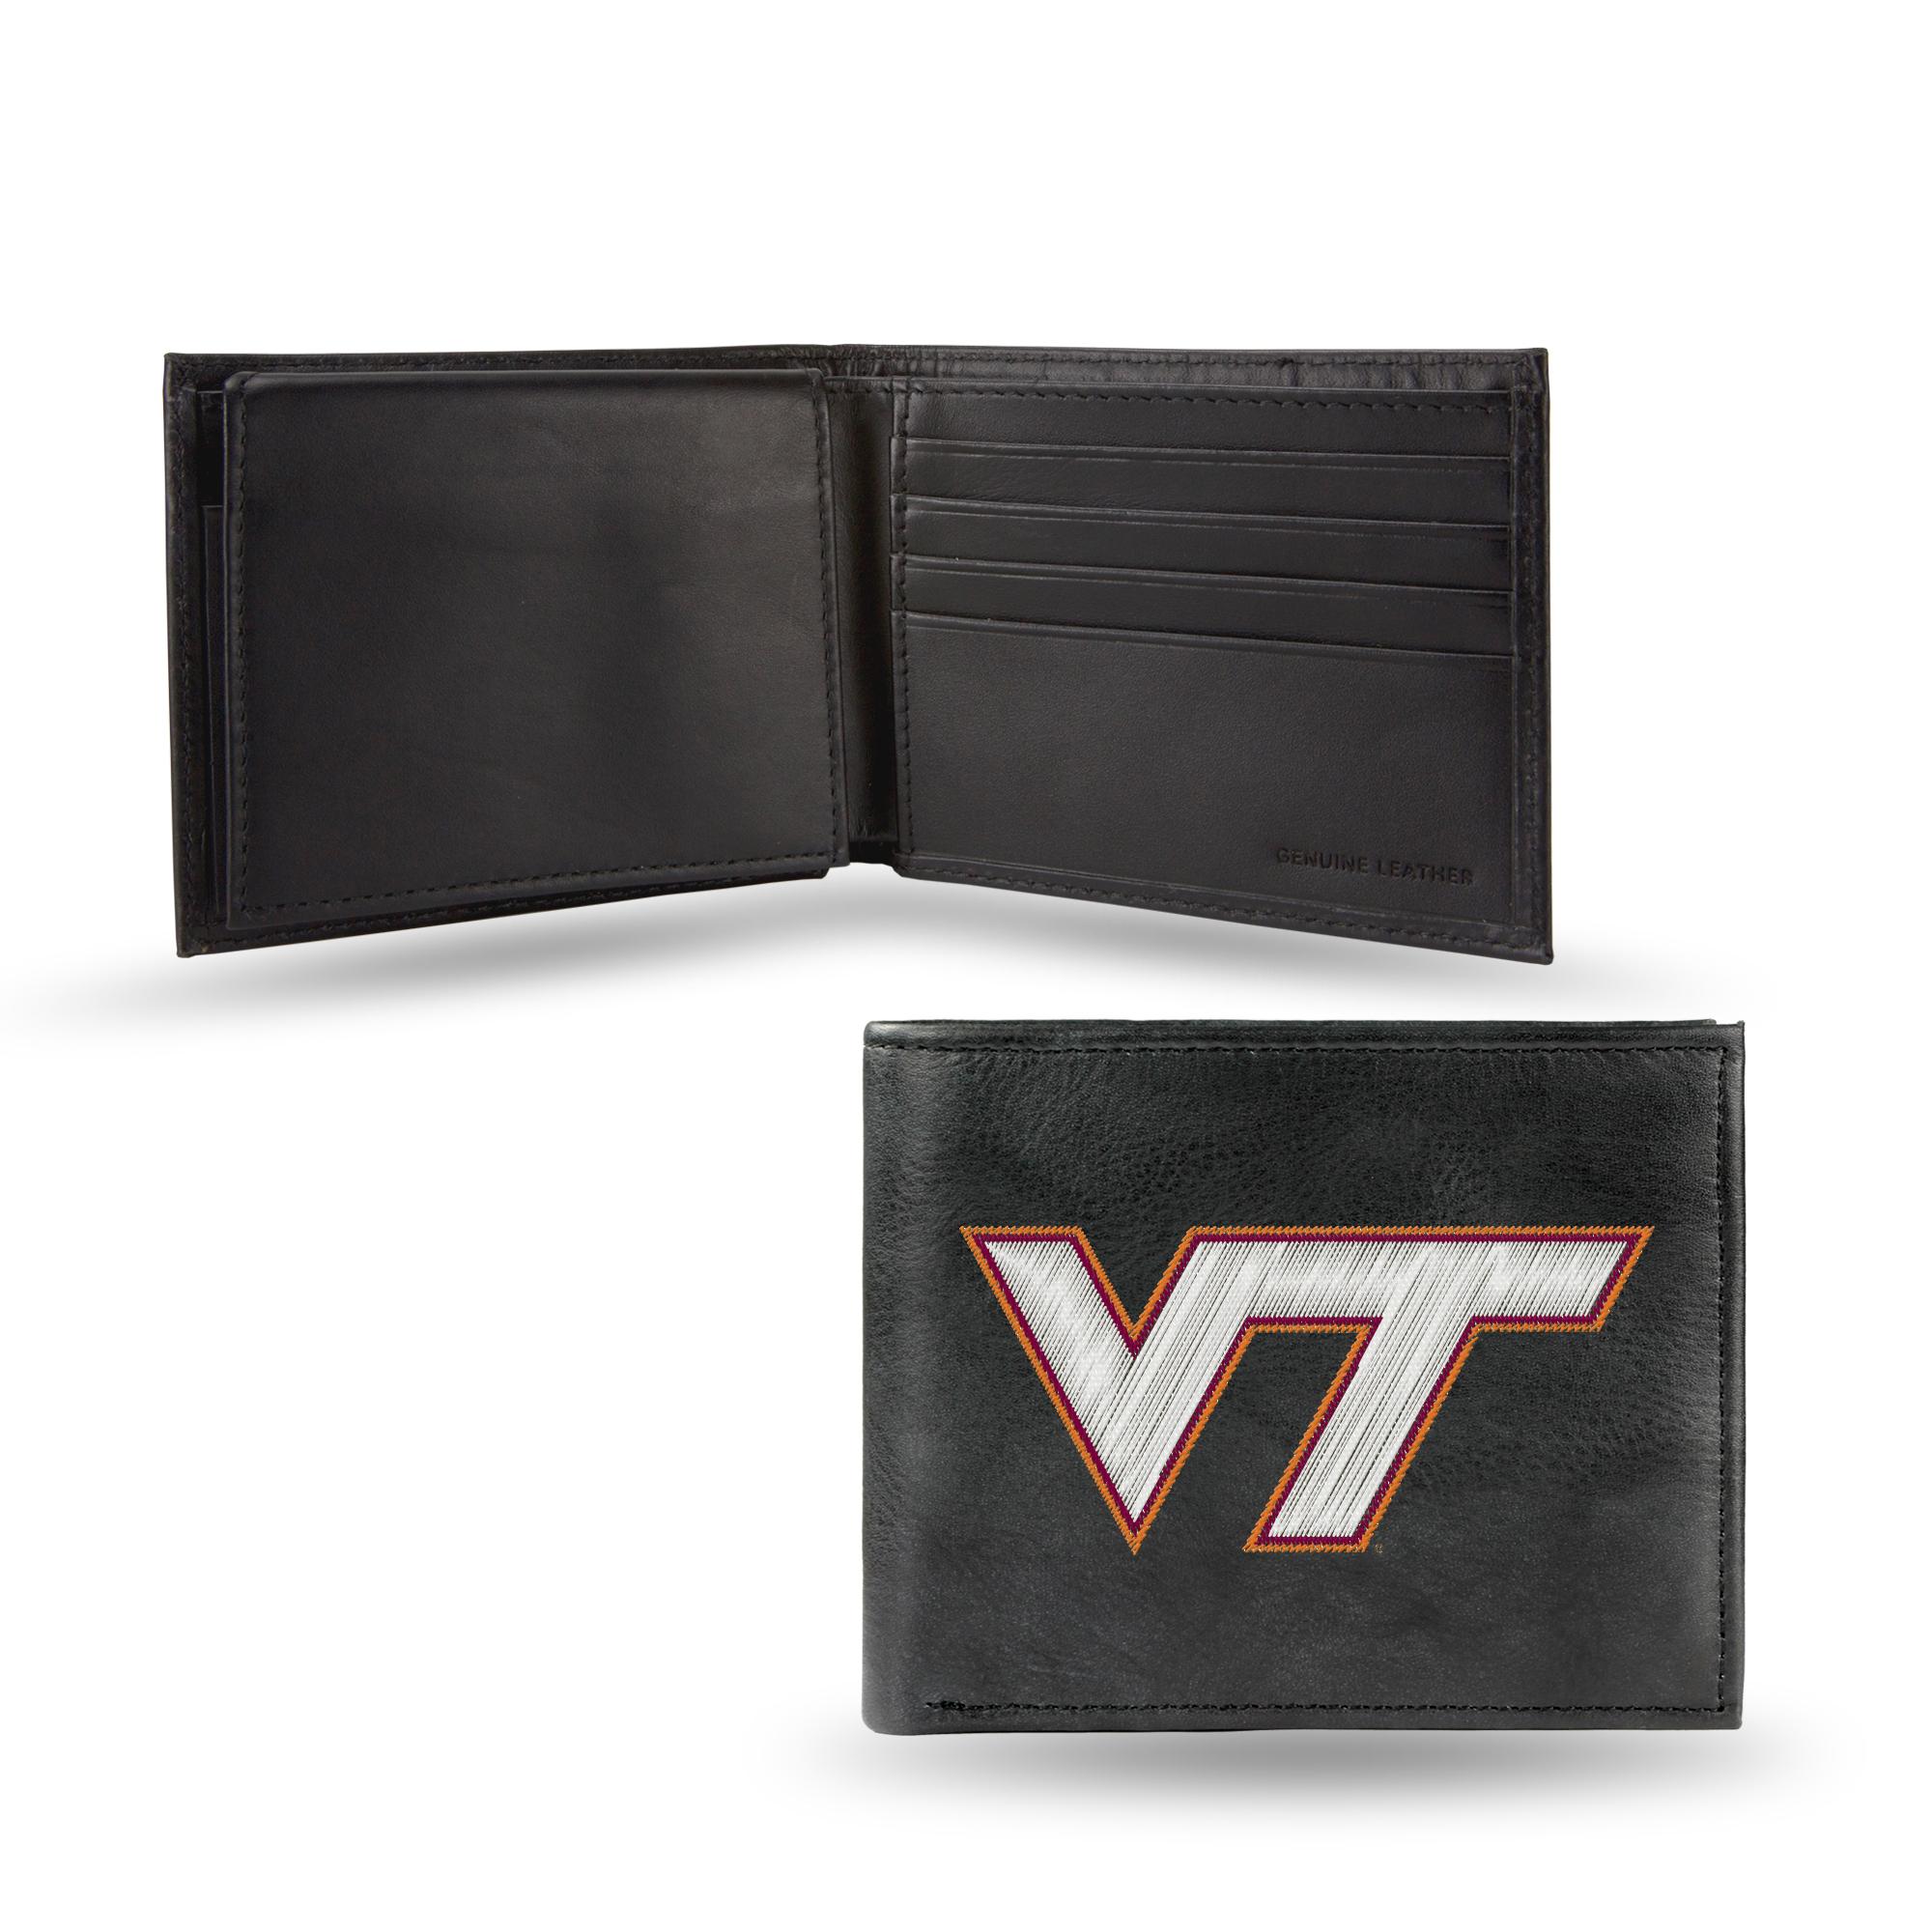 Virginia Tech Hokies Genuine Leather Wallet Black College NCAA Trifold Football